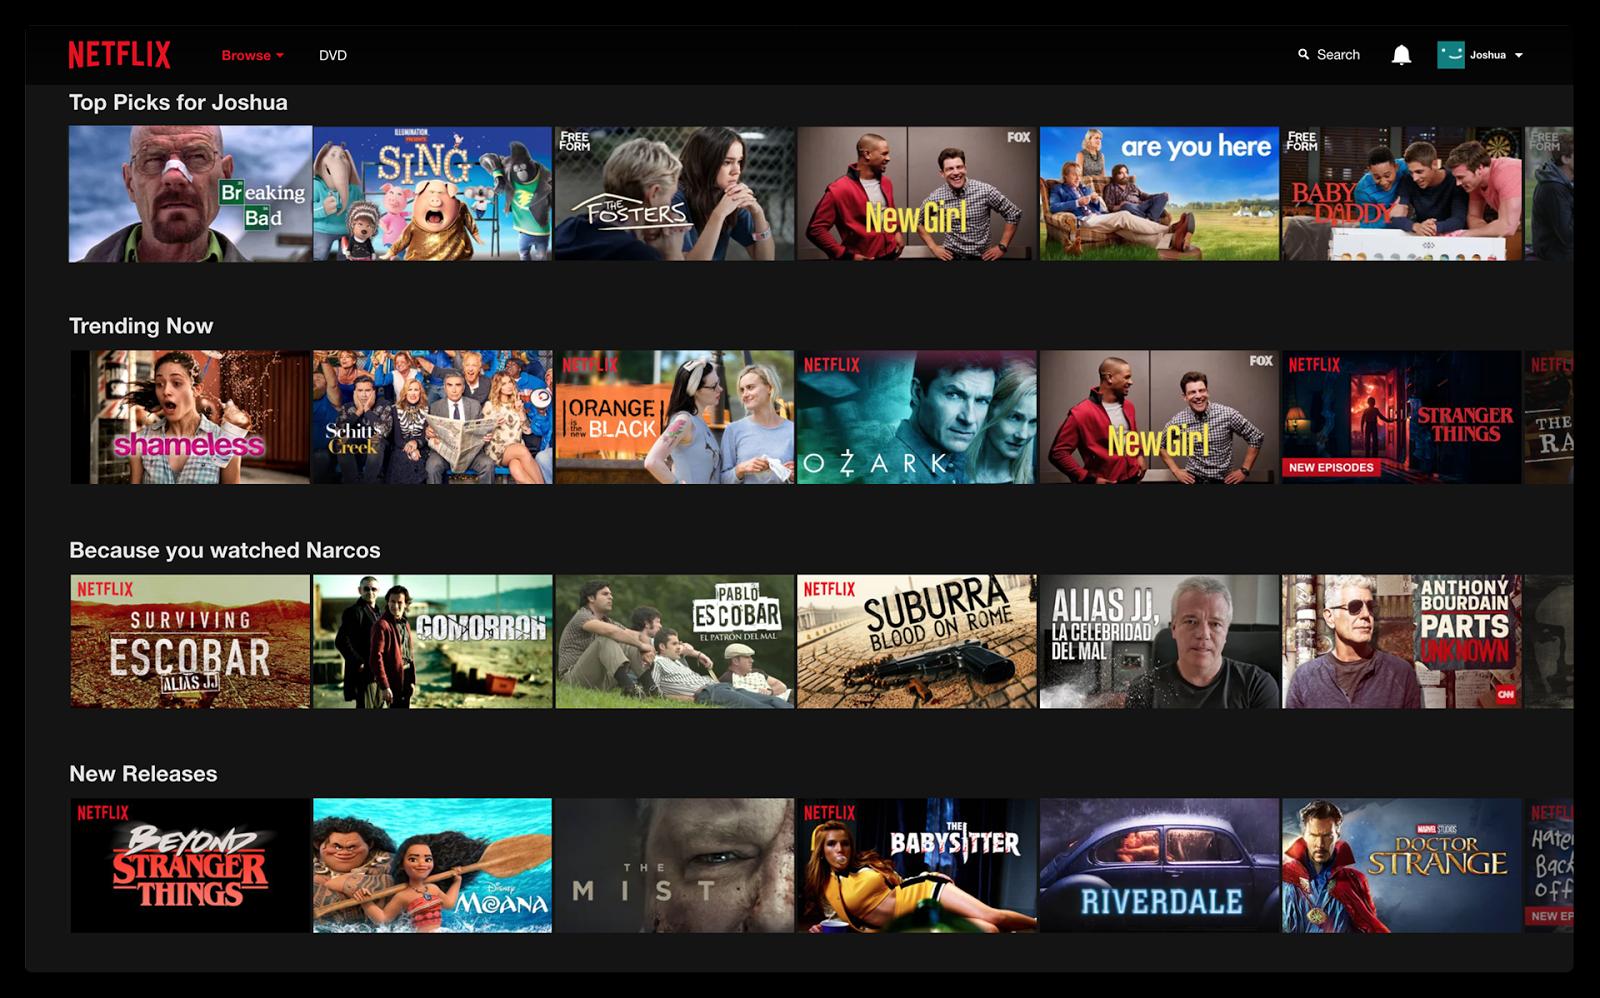 astrazeneca drug discovery, Netflix recommendation engine,